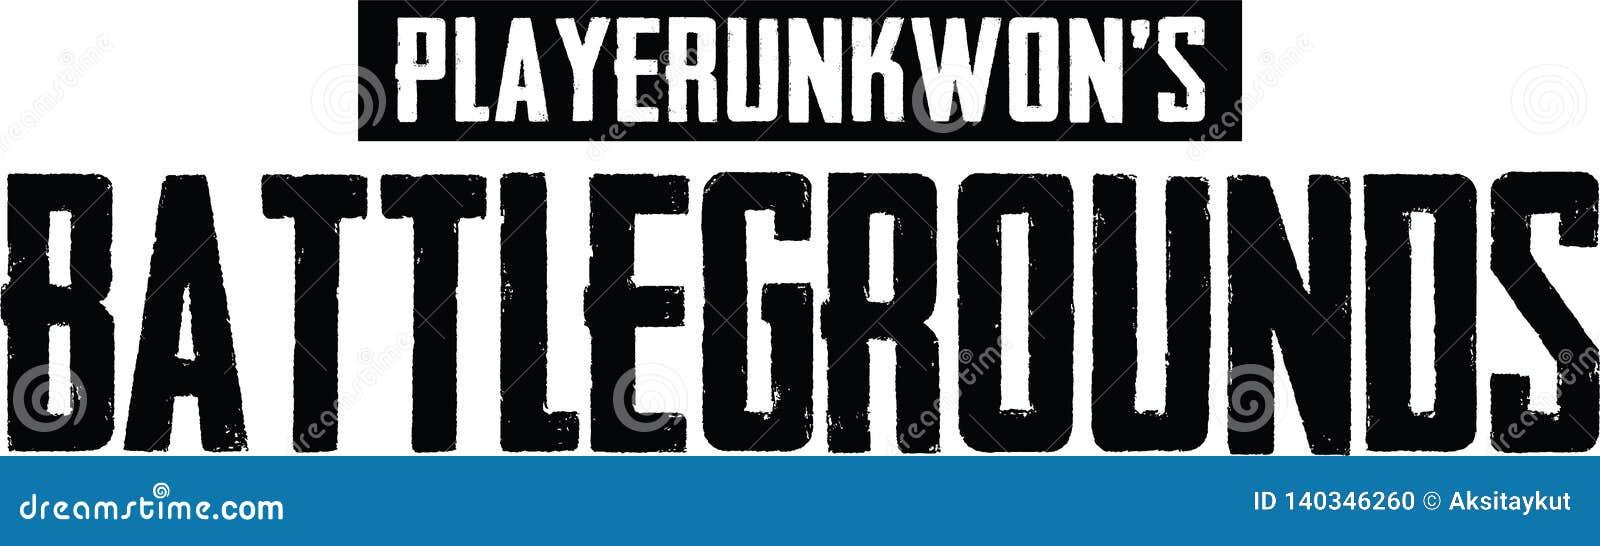 playerunknowns battlegrounds pubg logo images